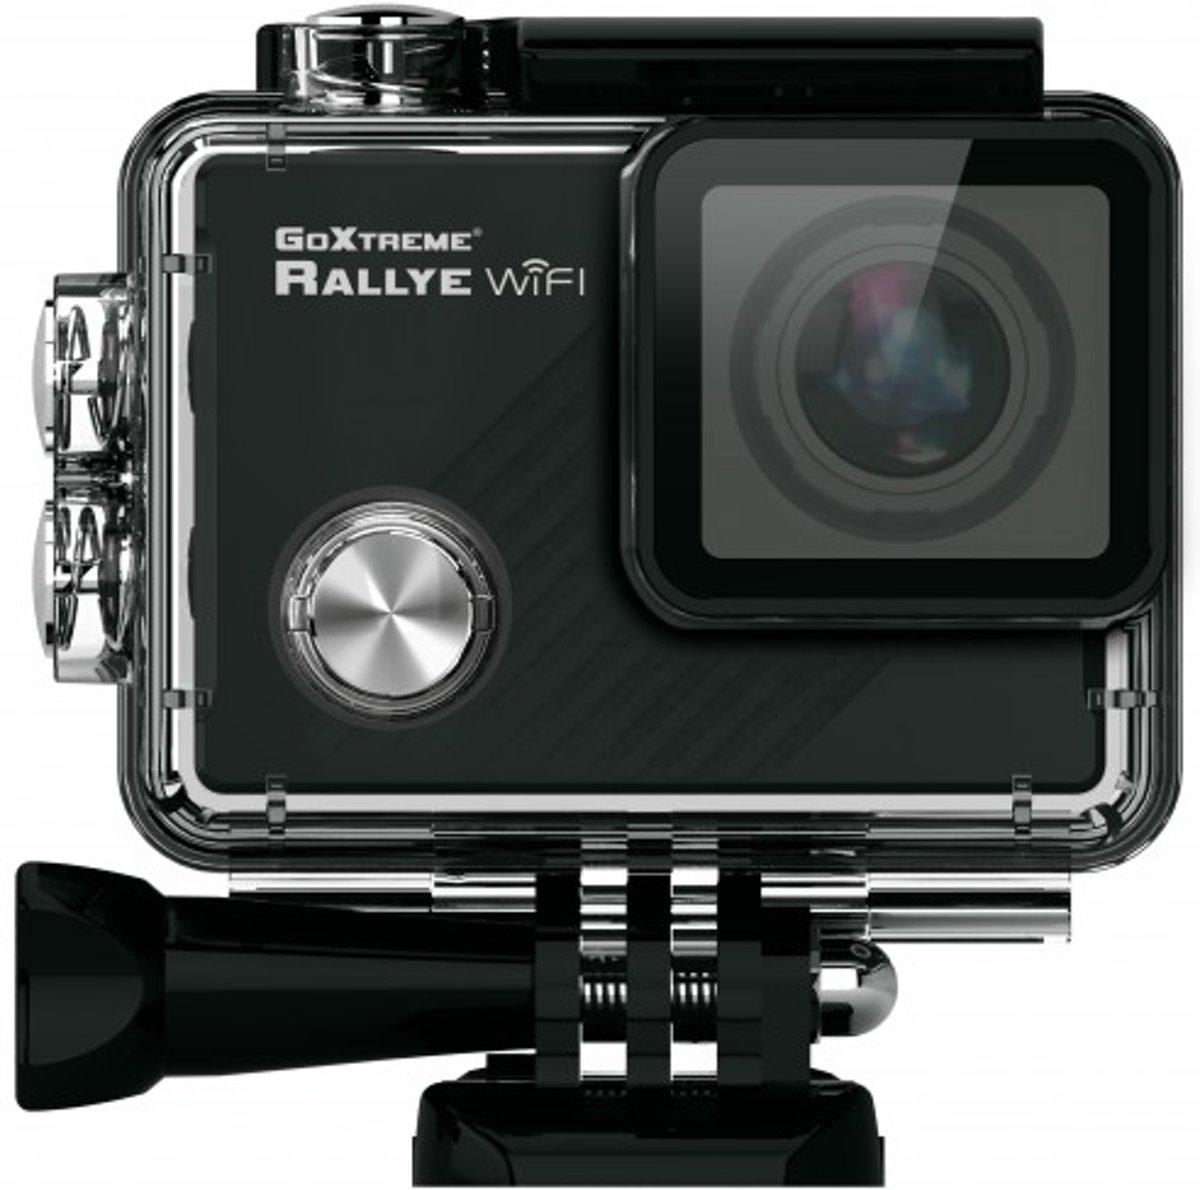 Easypix GoXtreme Rallye WiFi actiesportcamera Full HD 1 MP Wi-Fi